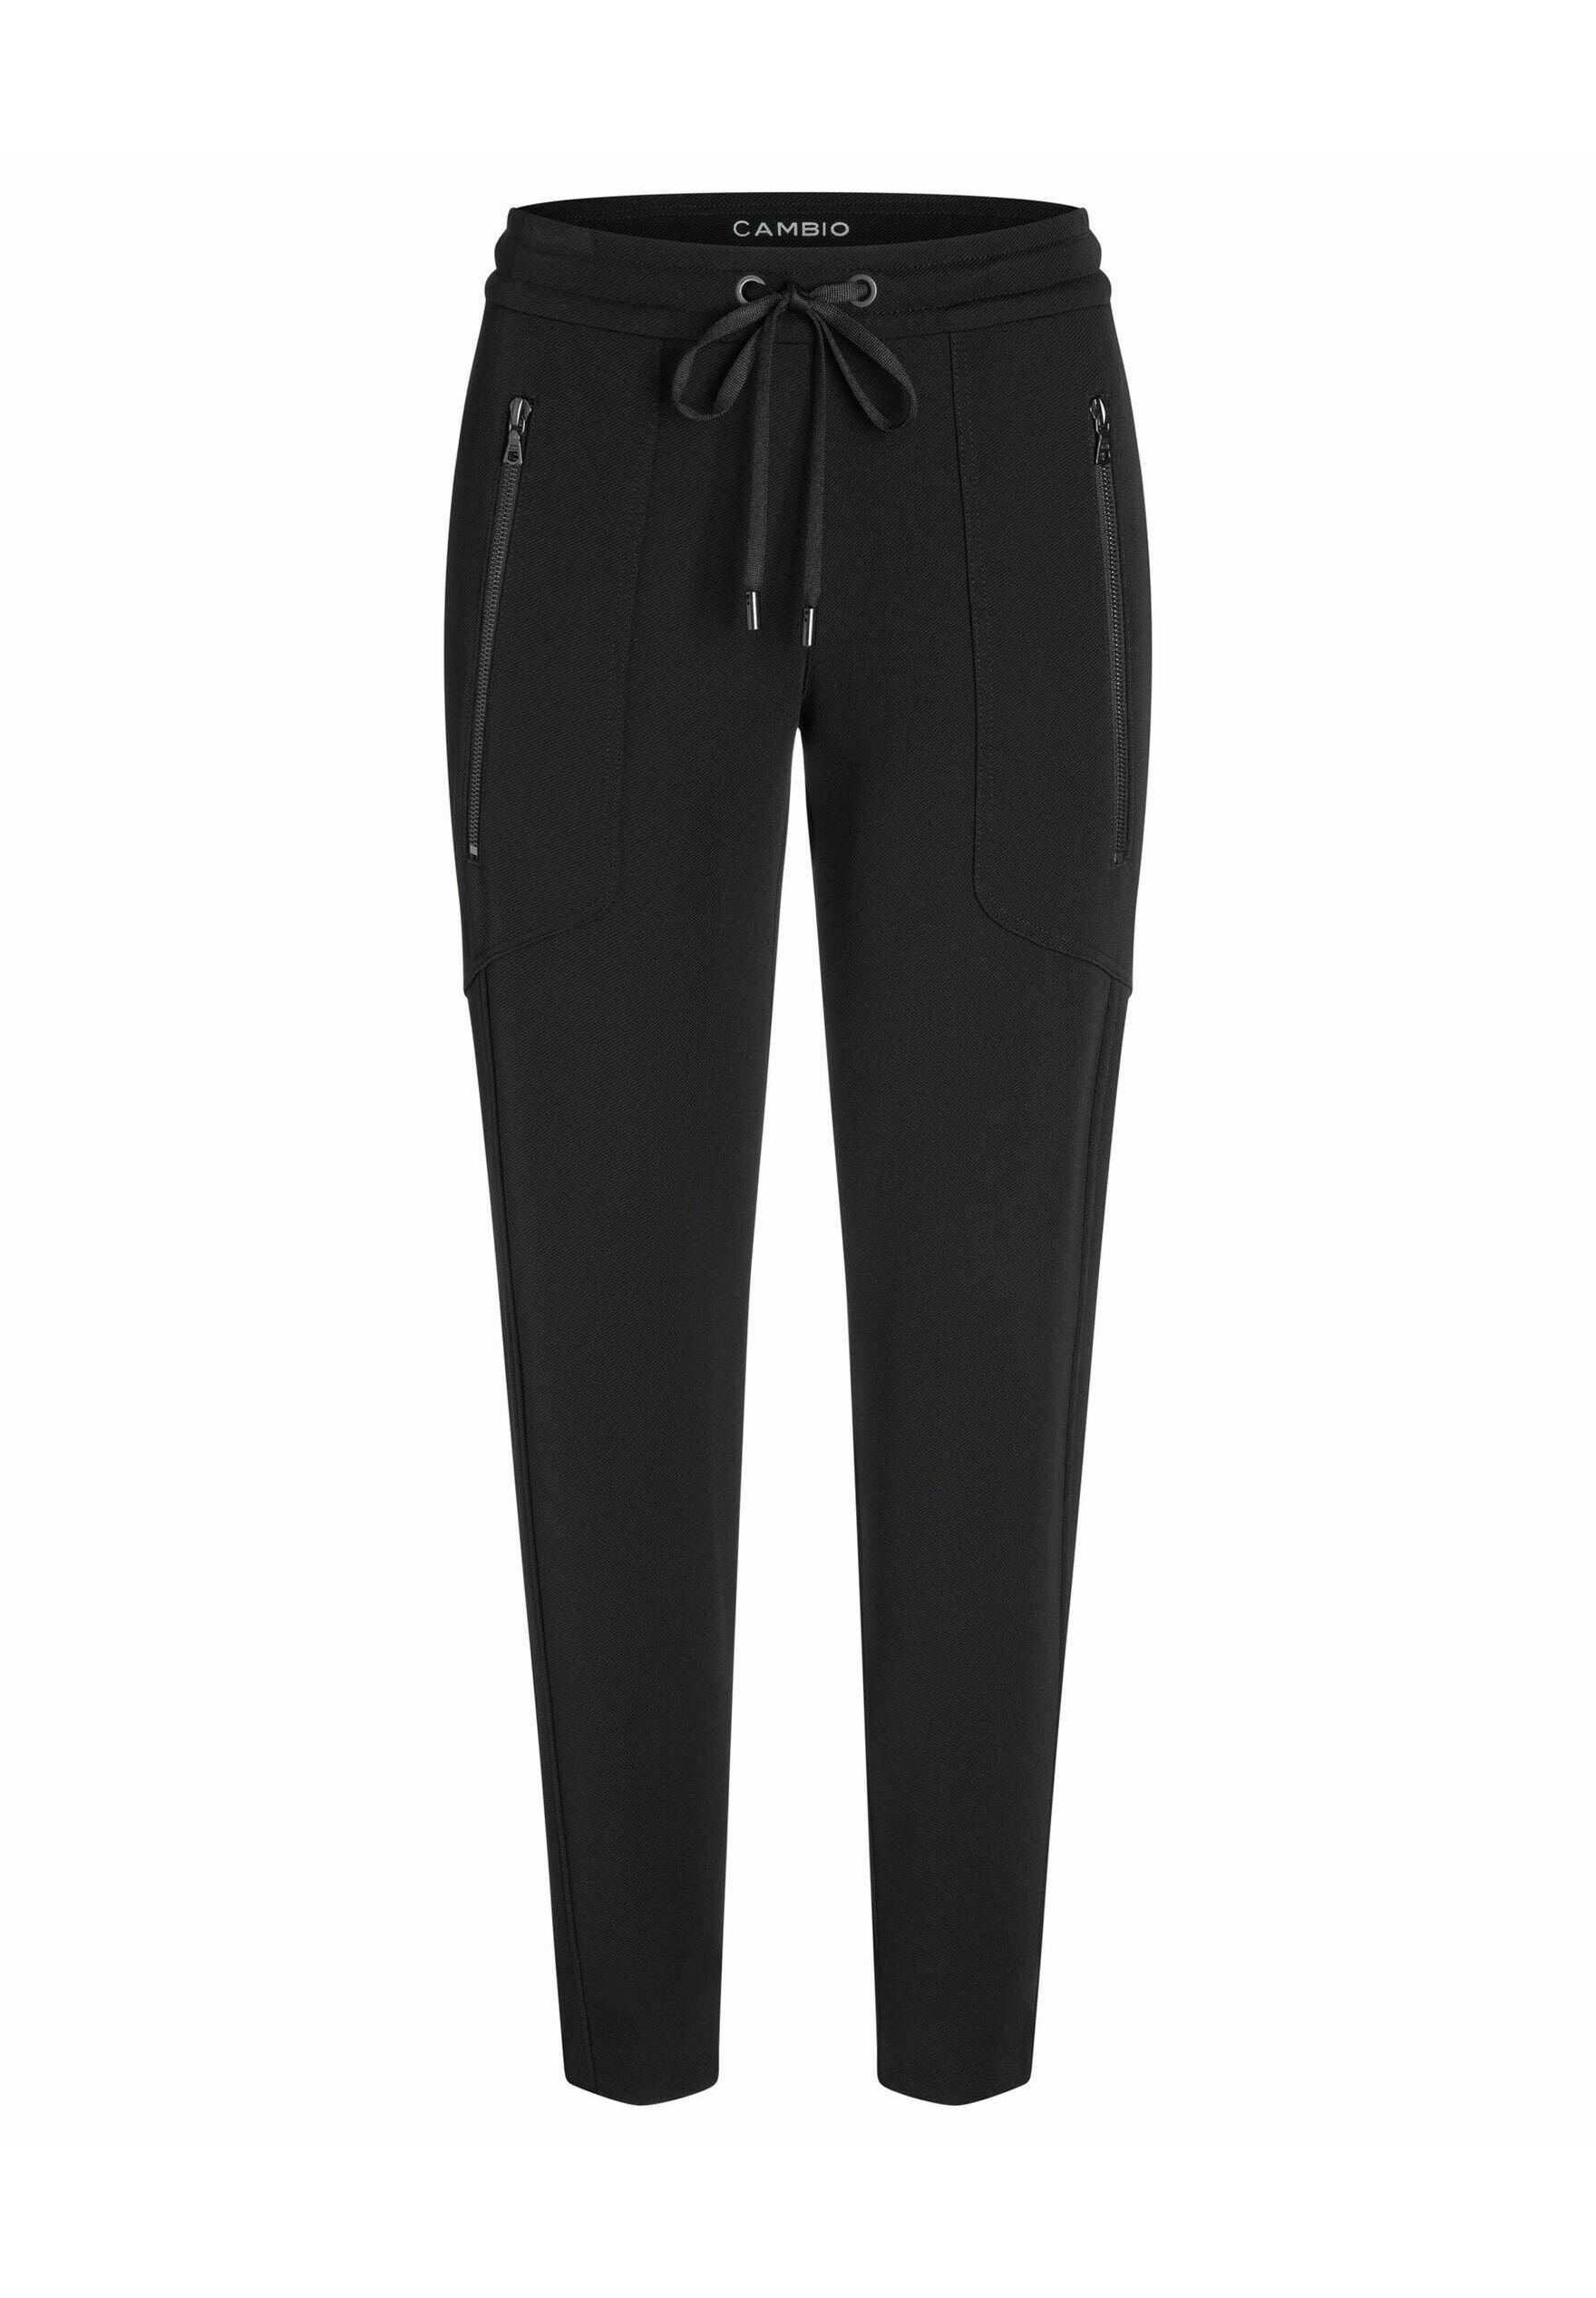 Damen Jogginghose - schwarz